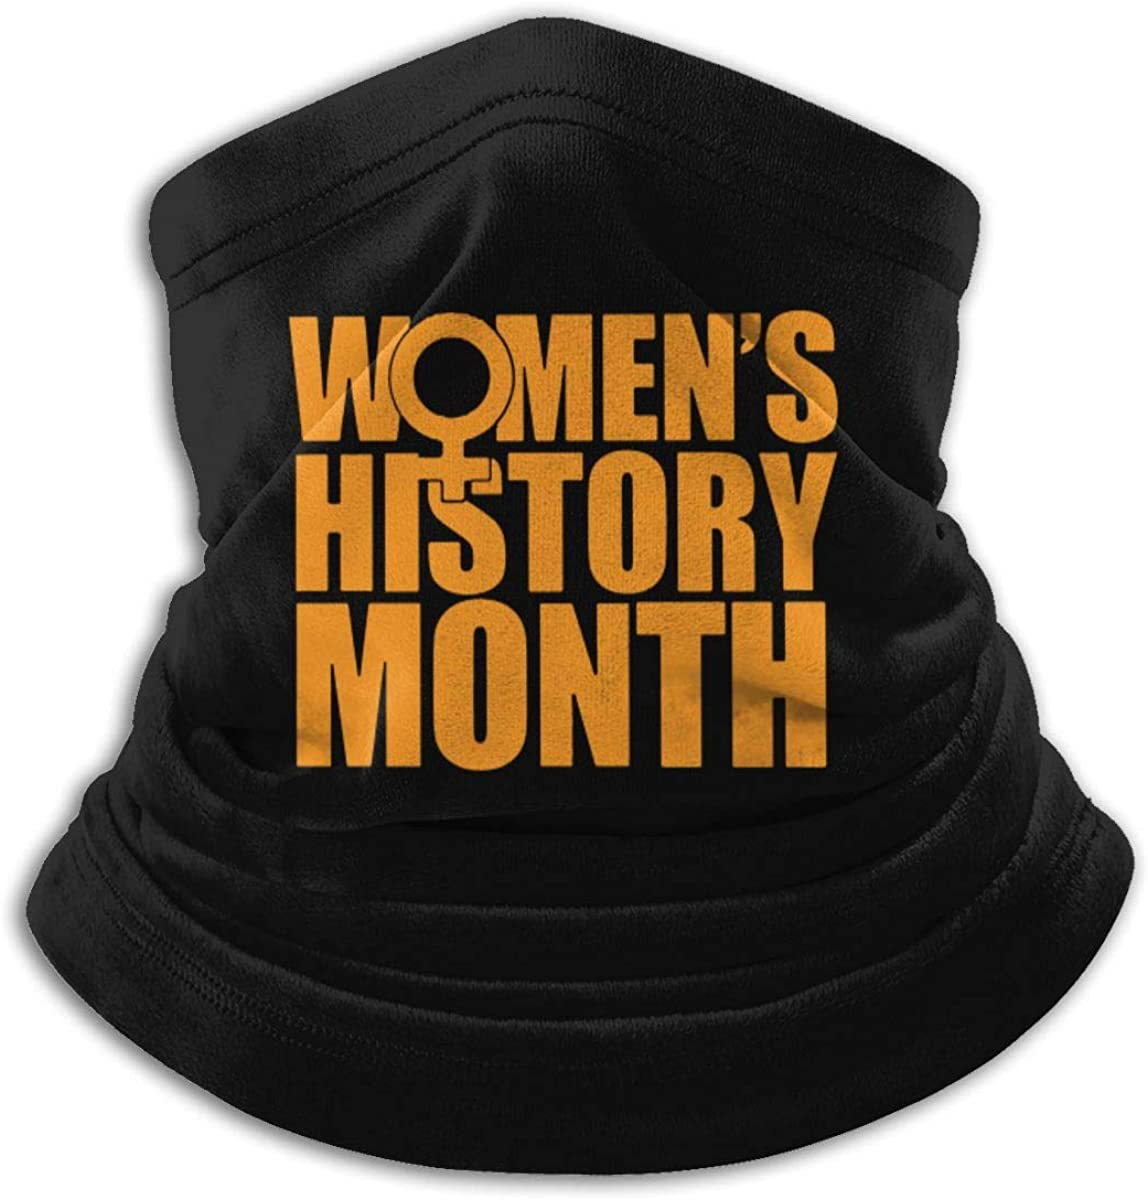 Women's History Month Black Multi-function Neck Warmer Gaiter Polyester Neck Warmer Windproof Winter Neck Gaiter Cold Weather Scarf For Men Women